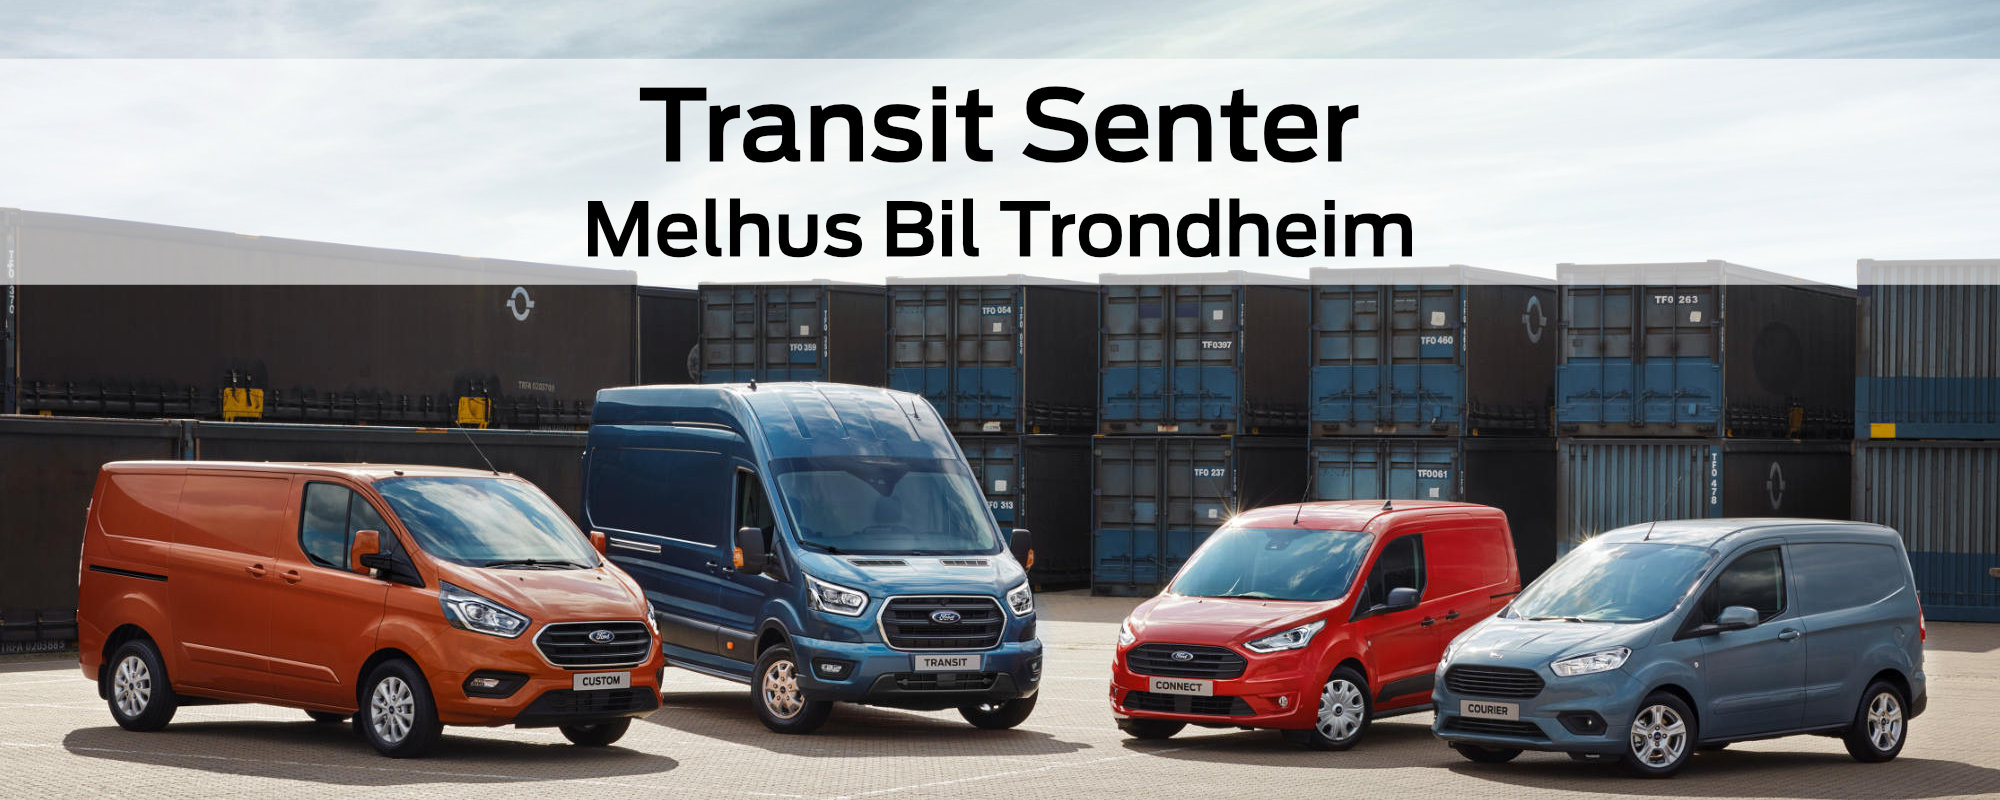 Transit Senter - Melhus Bil Trondheim